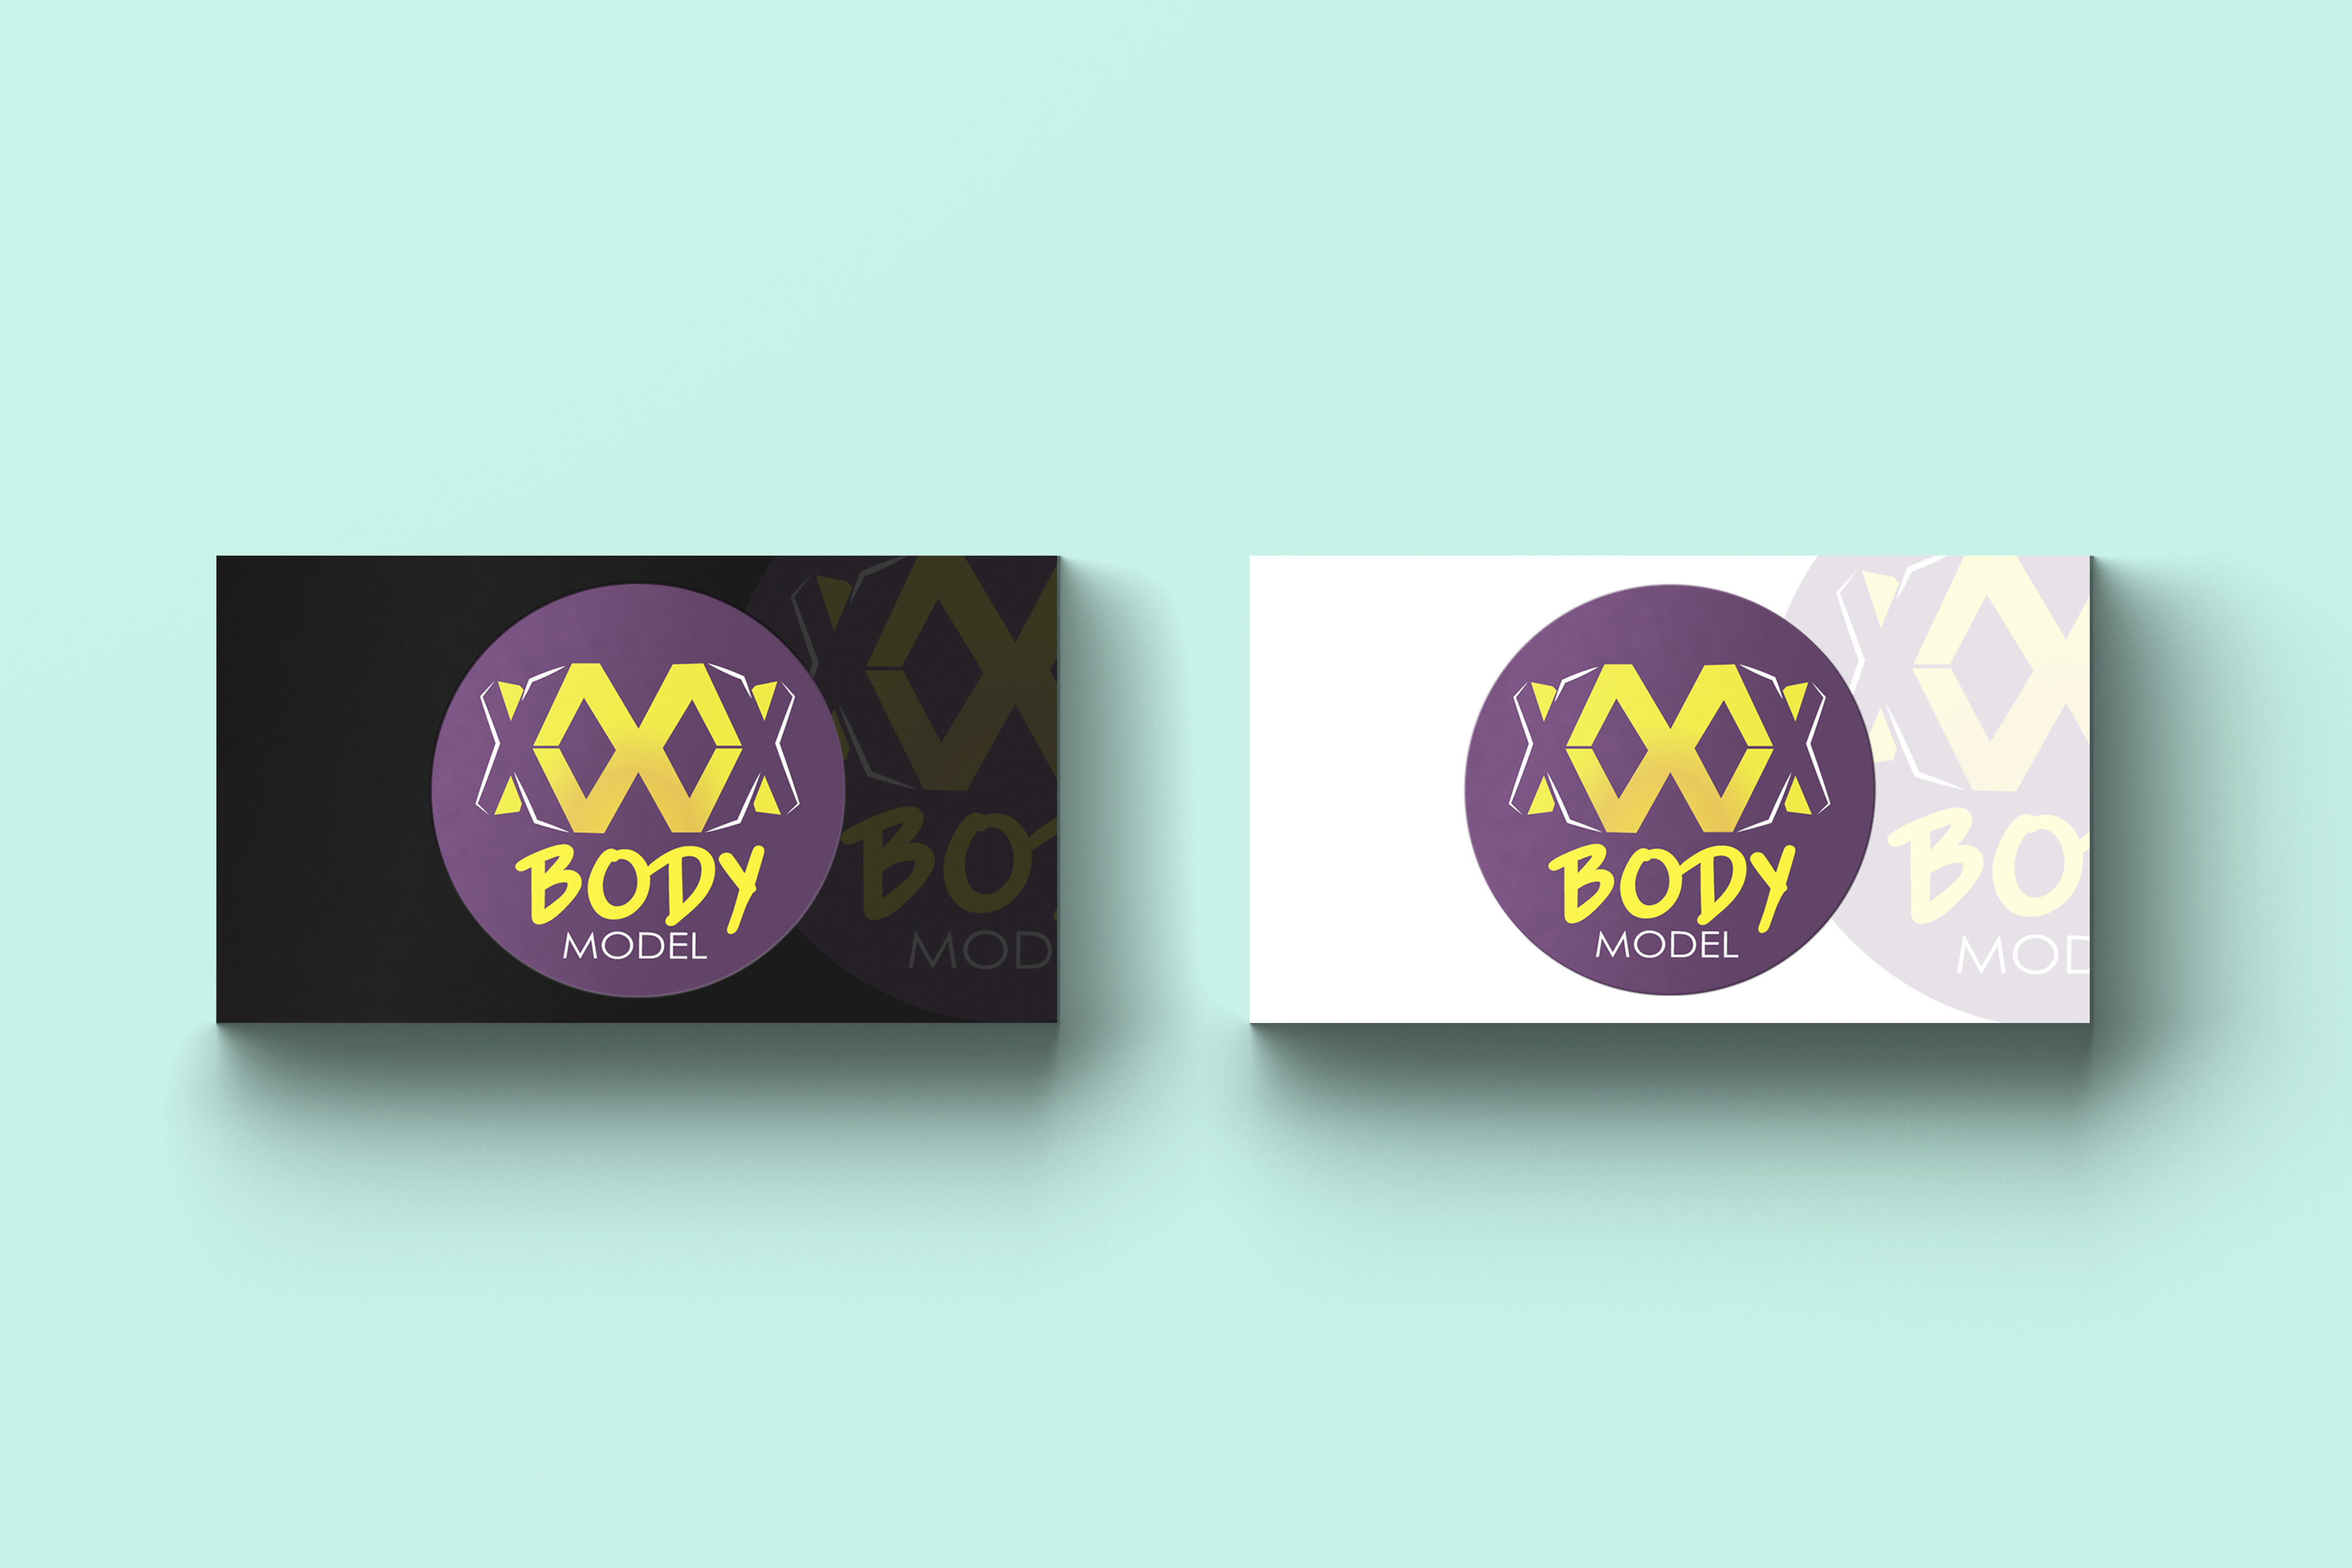 Разработка логотипа (видеоблог для моделей) фото f_0555b22a7467c468.jpg